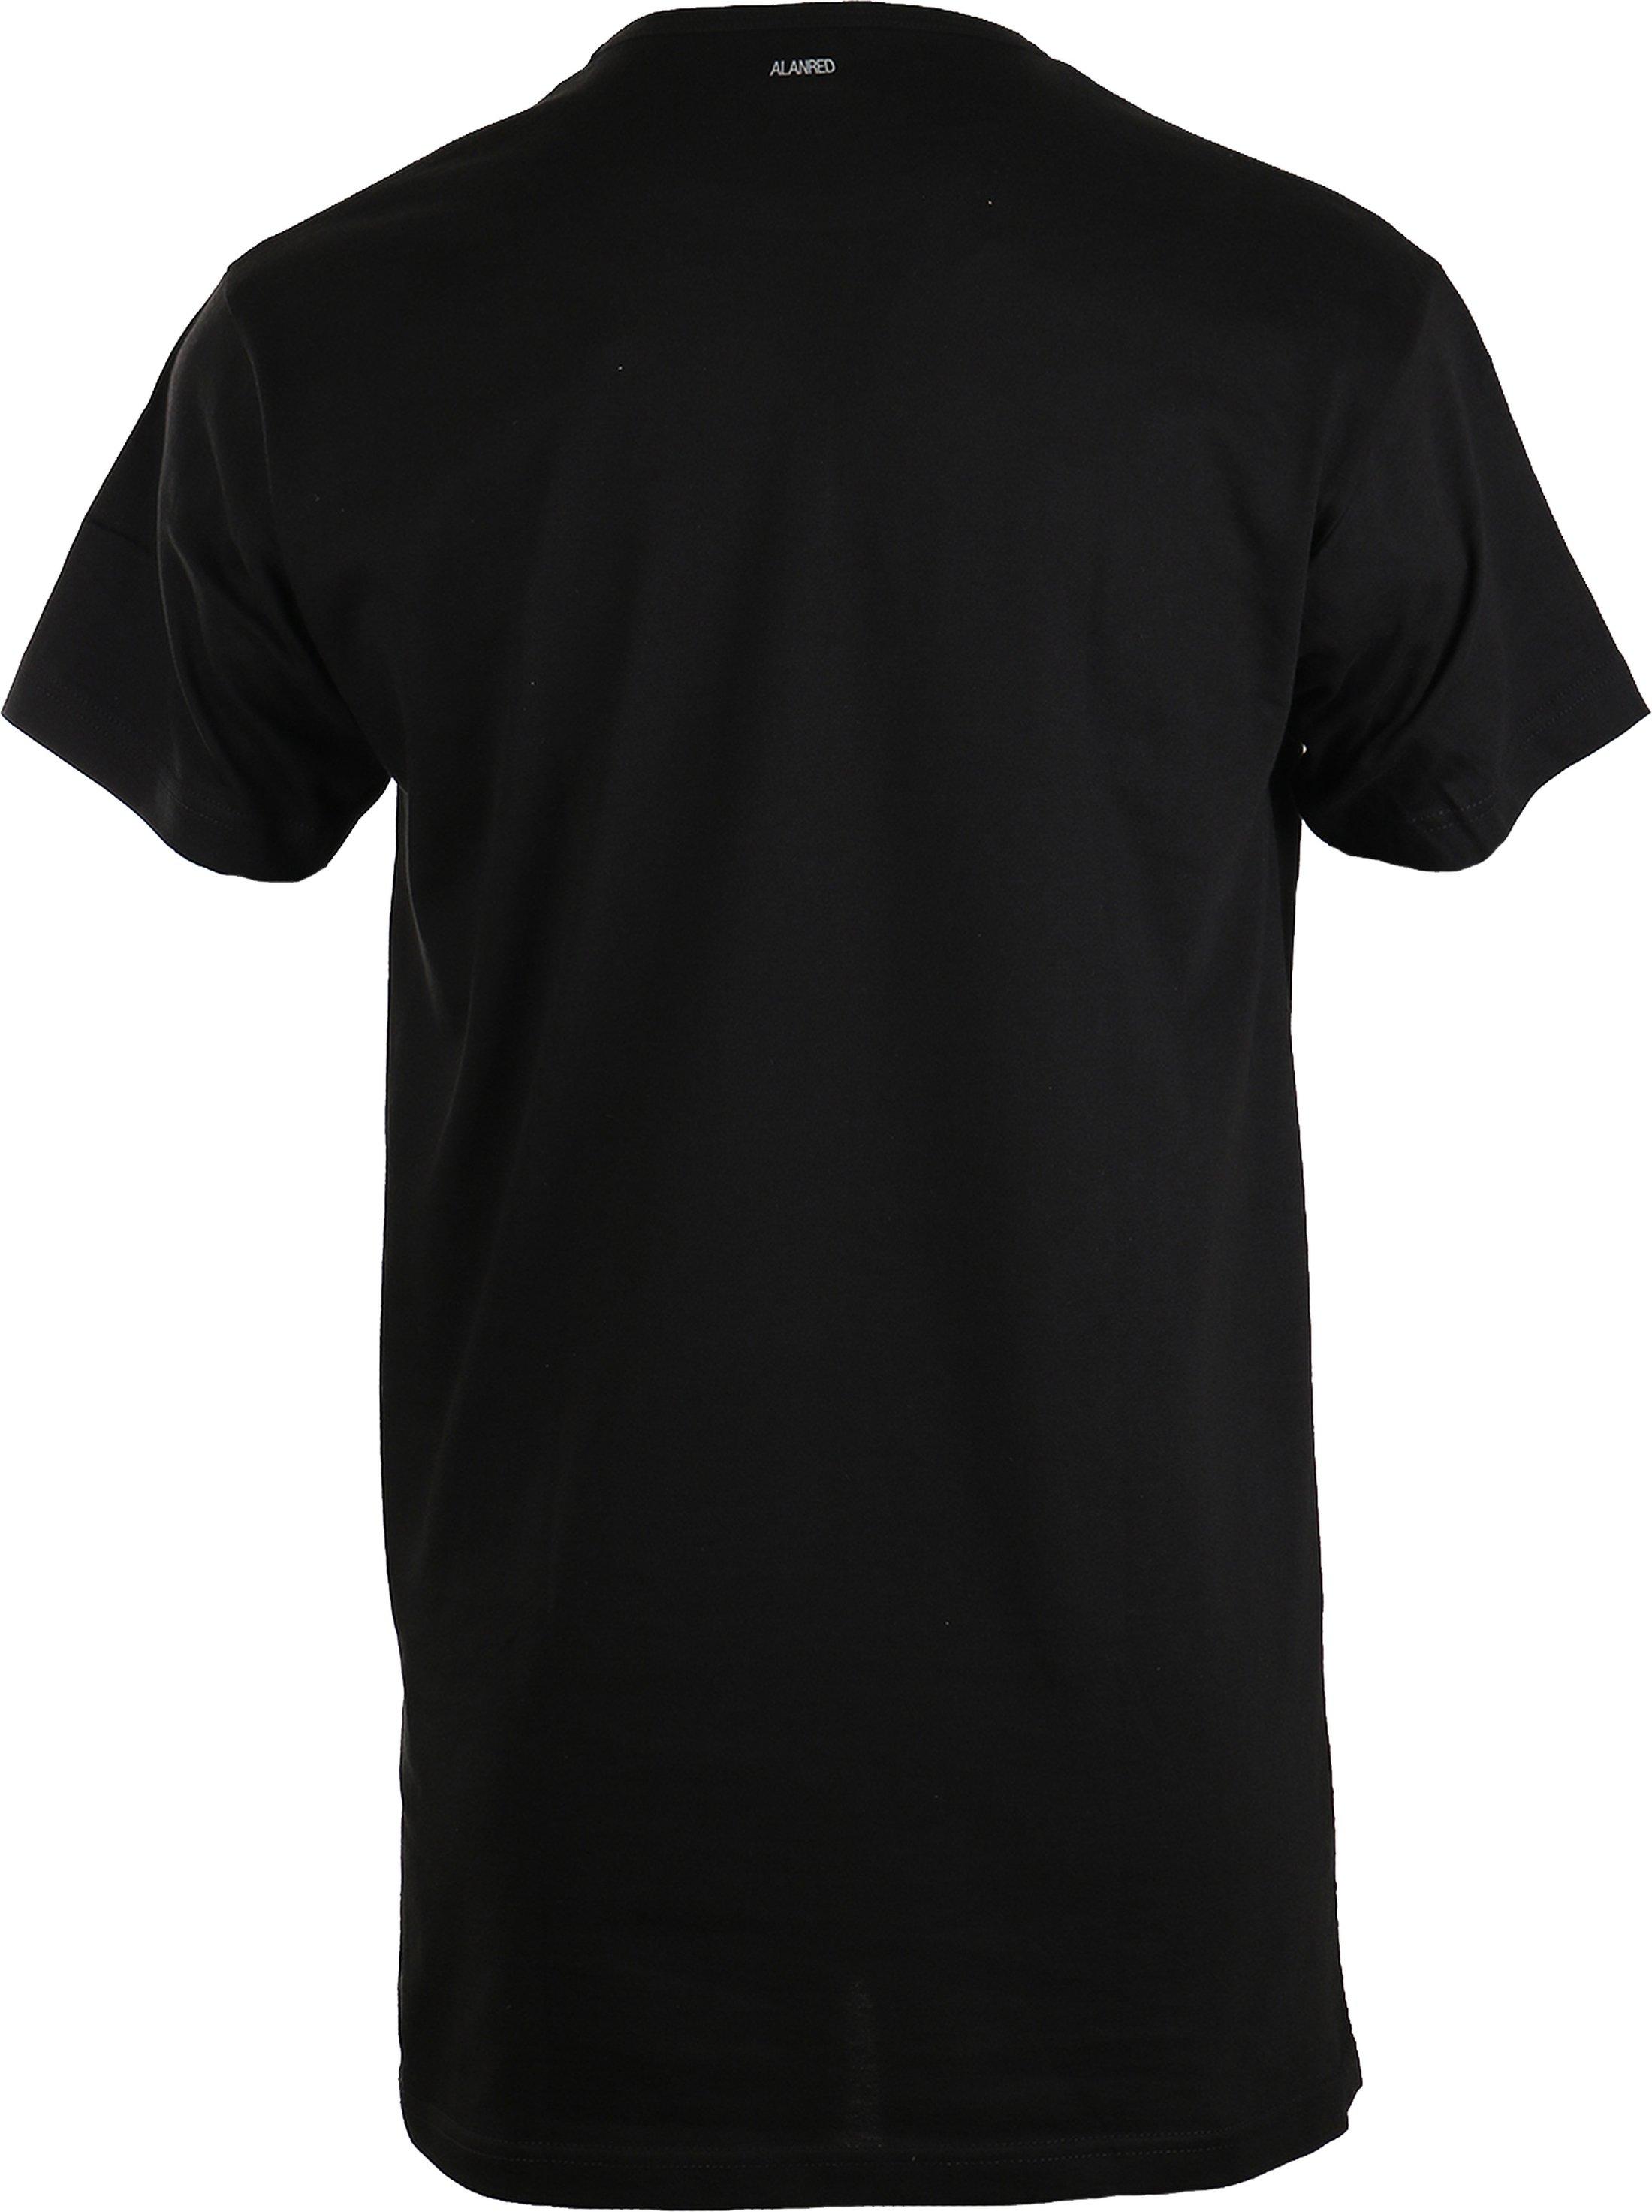 Alan Red Derby Extra Lang T-Shirt Zwart (1Pack) foto 1